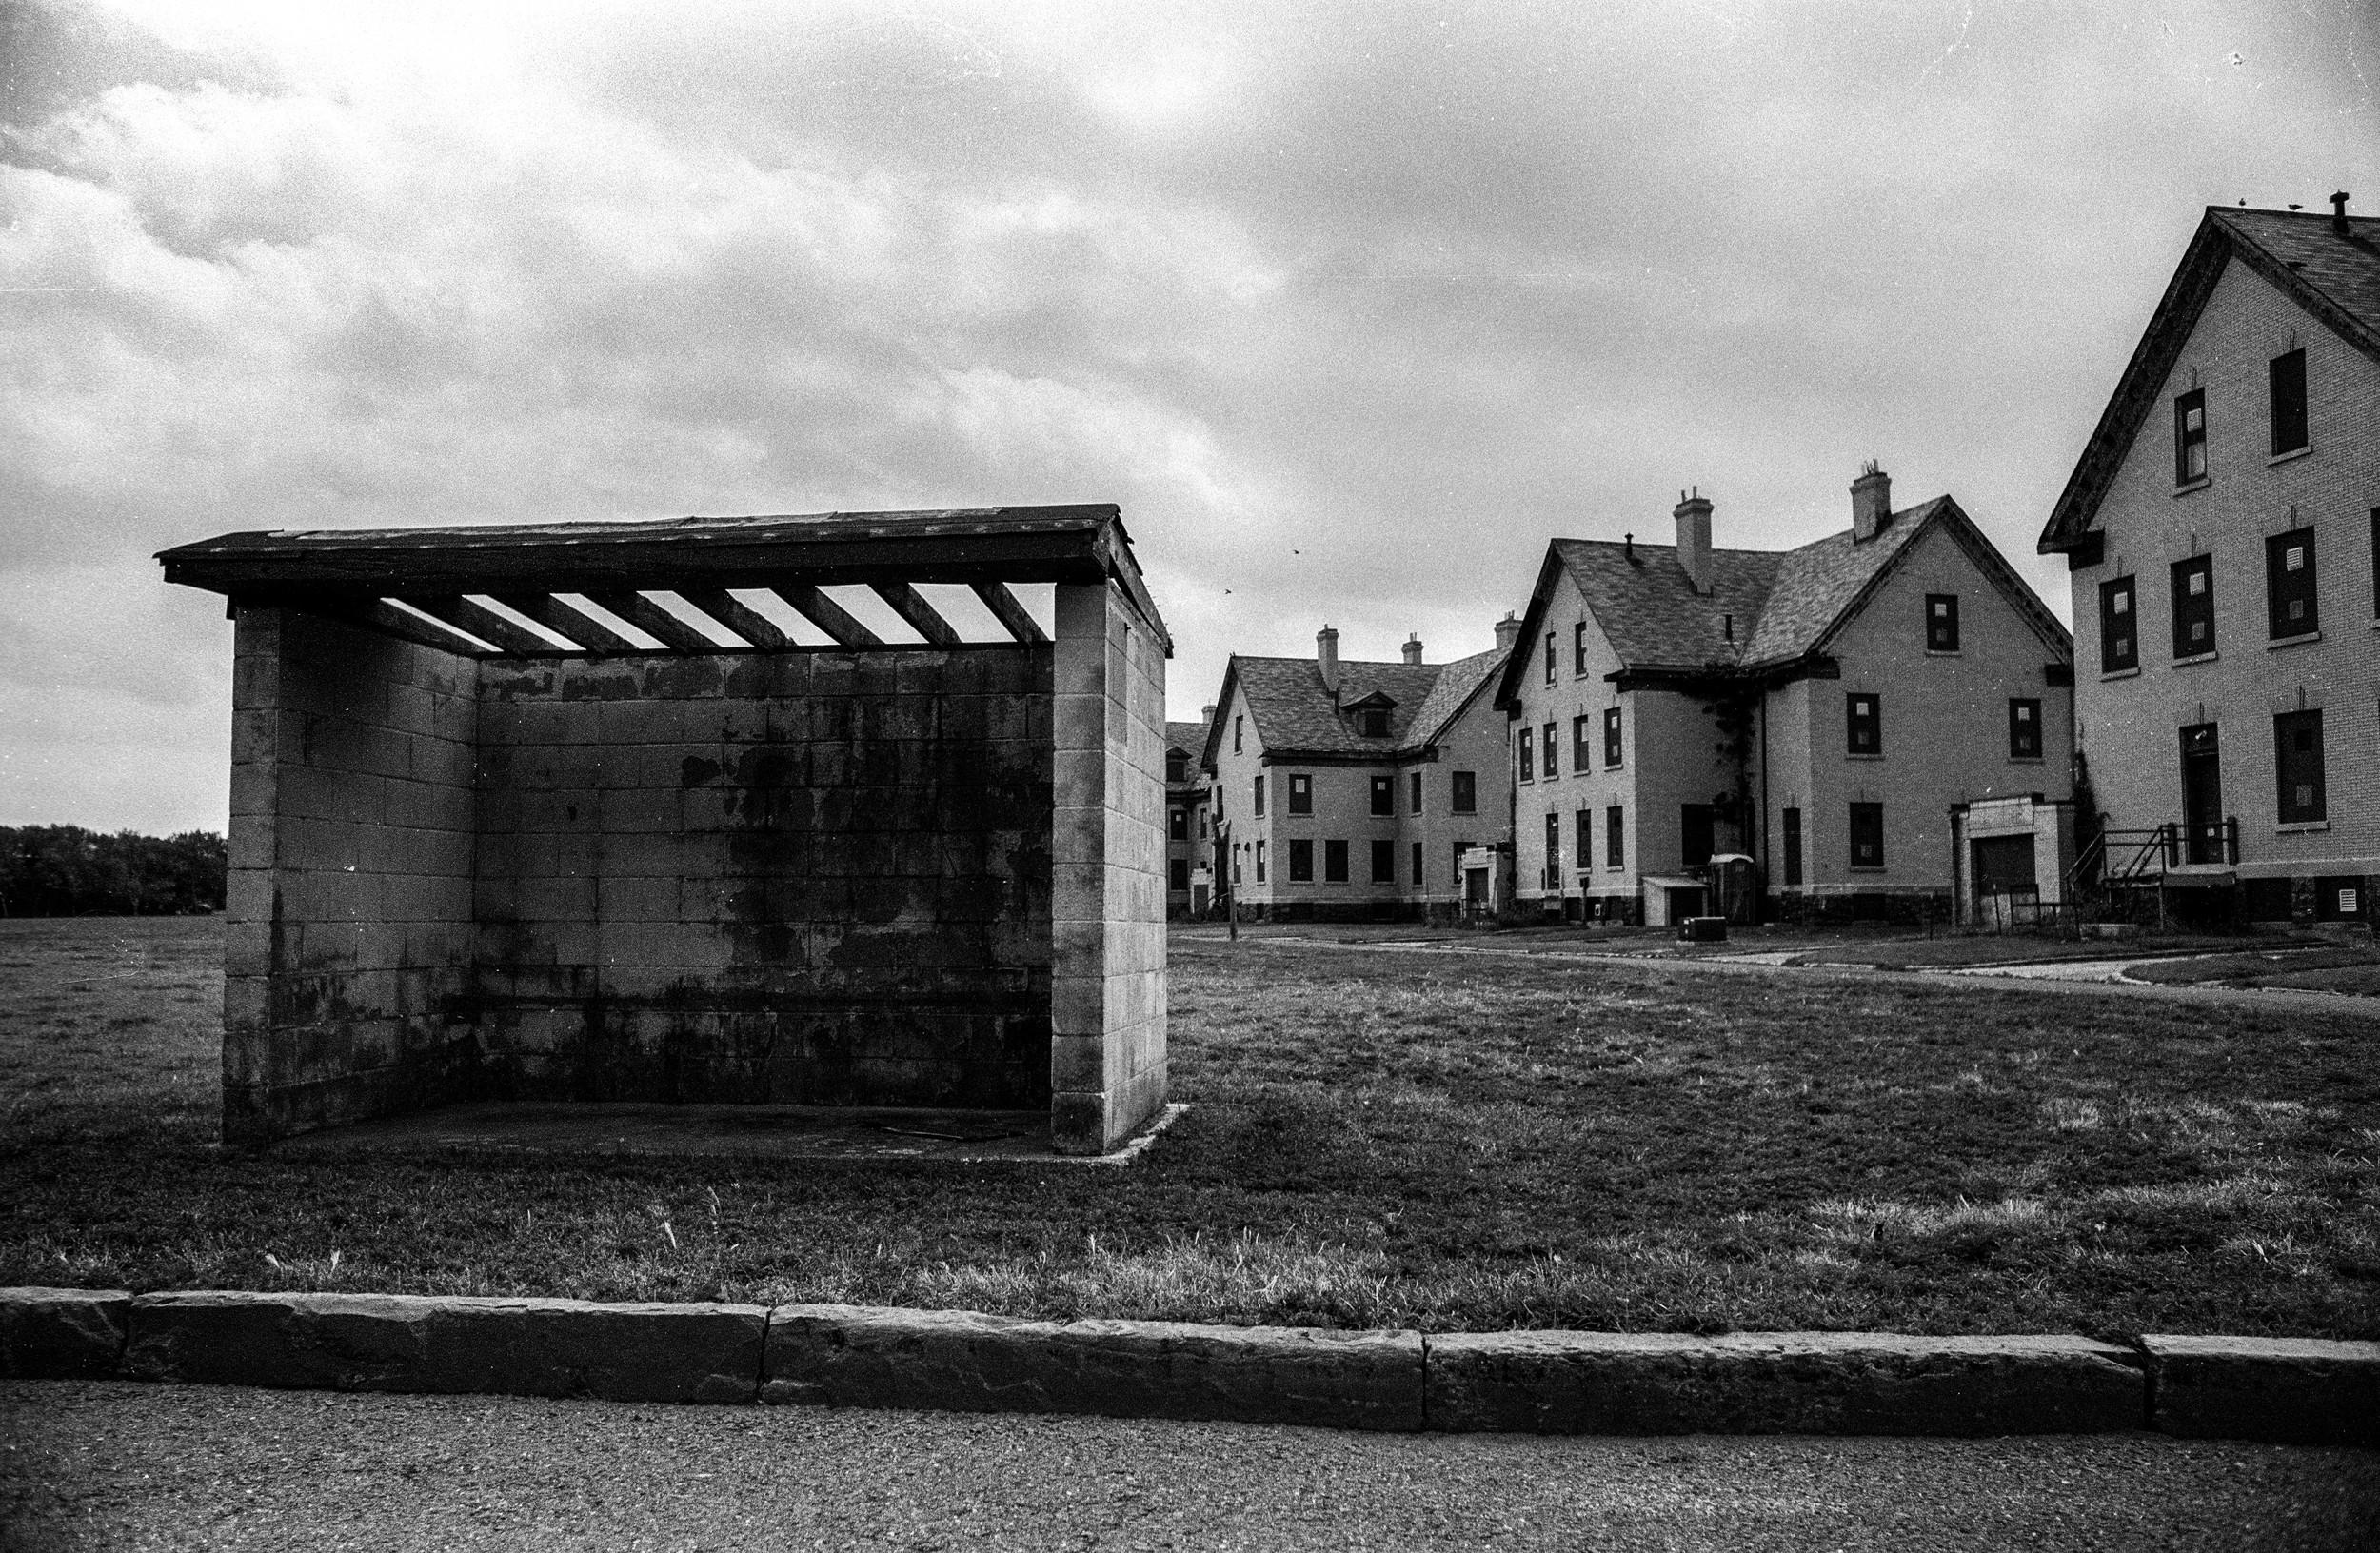 Abandoned Bus Stop, Sandy Hook - 2015